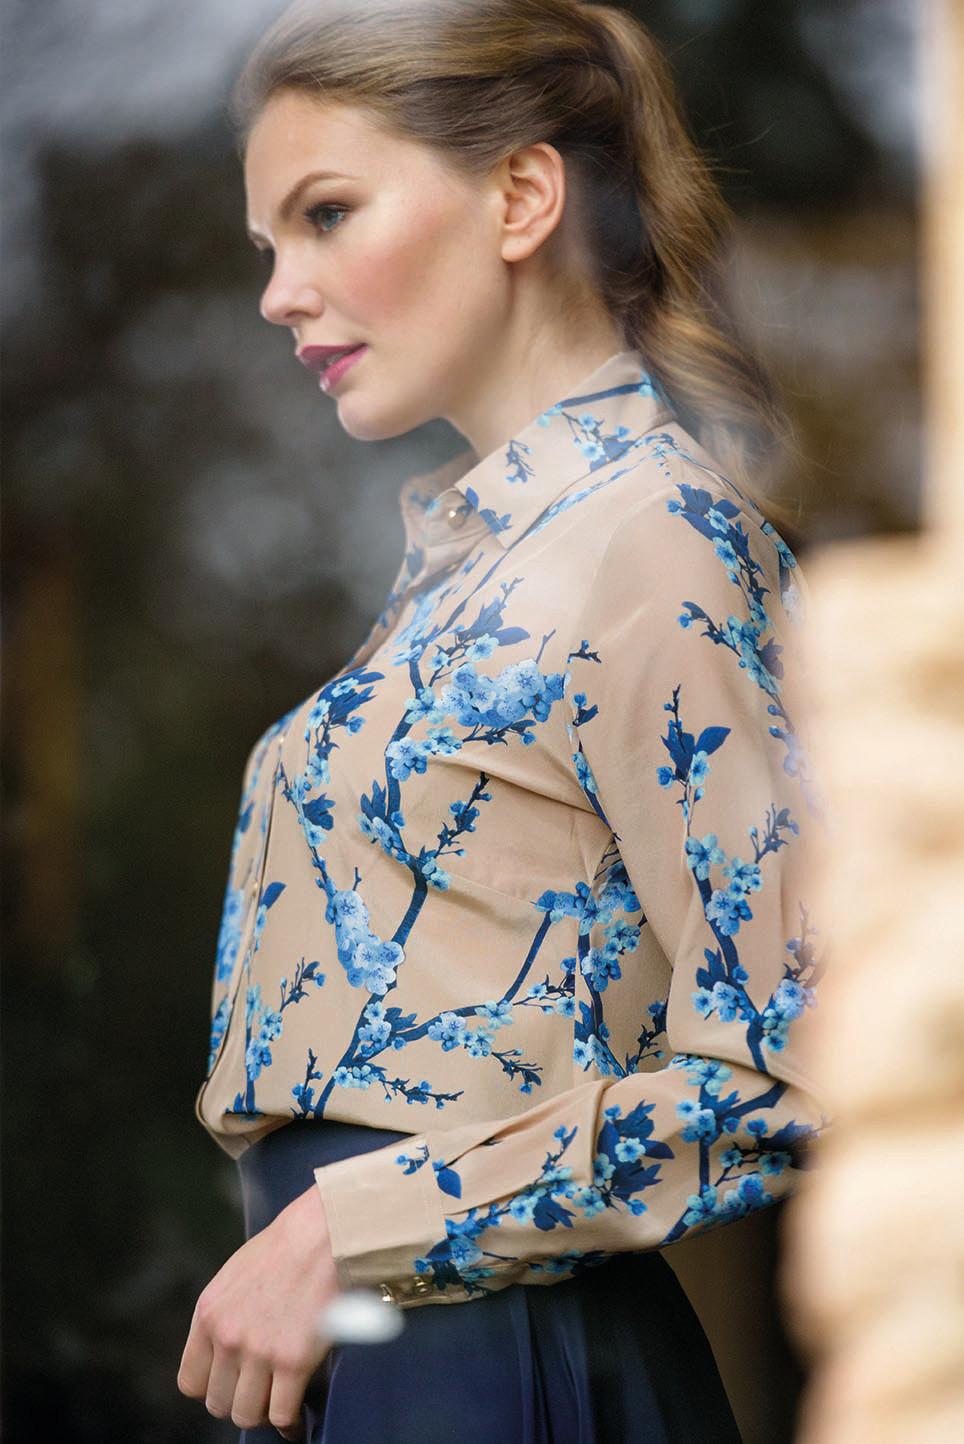 Sophie Cameron-Davies